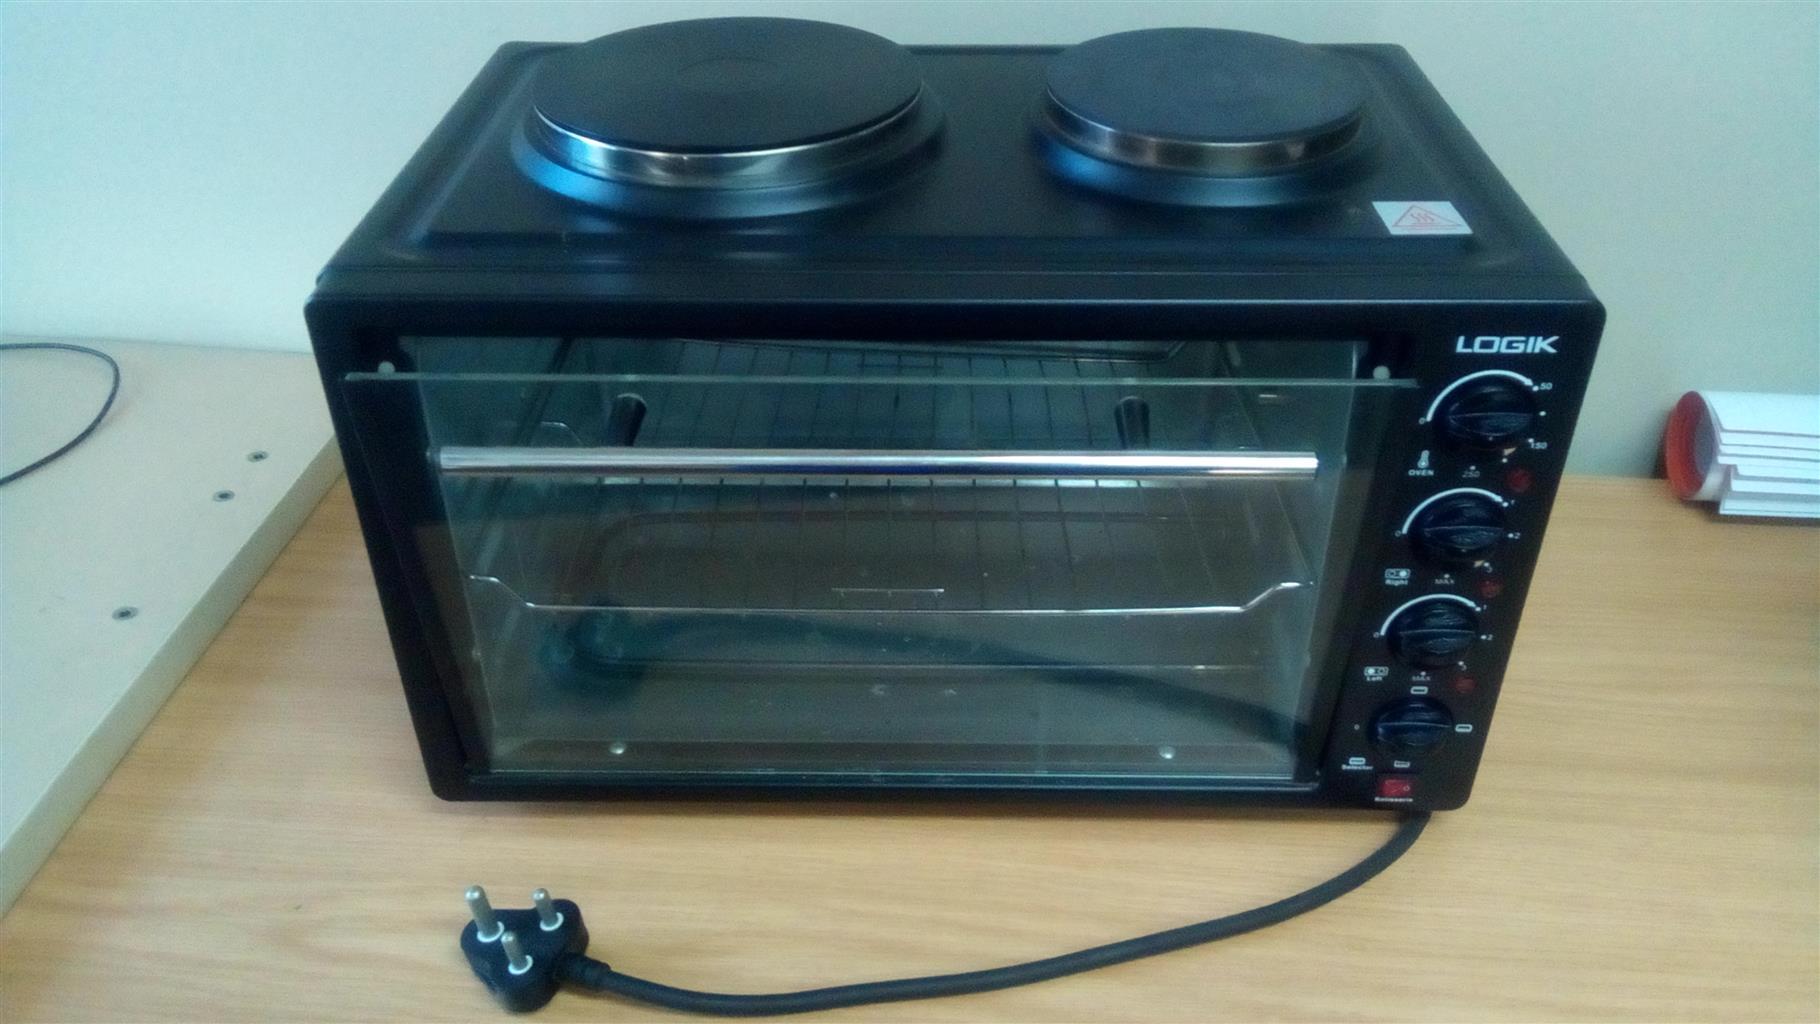 Logik Compact Stove and Oven